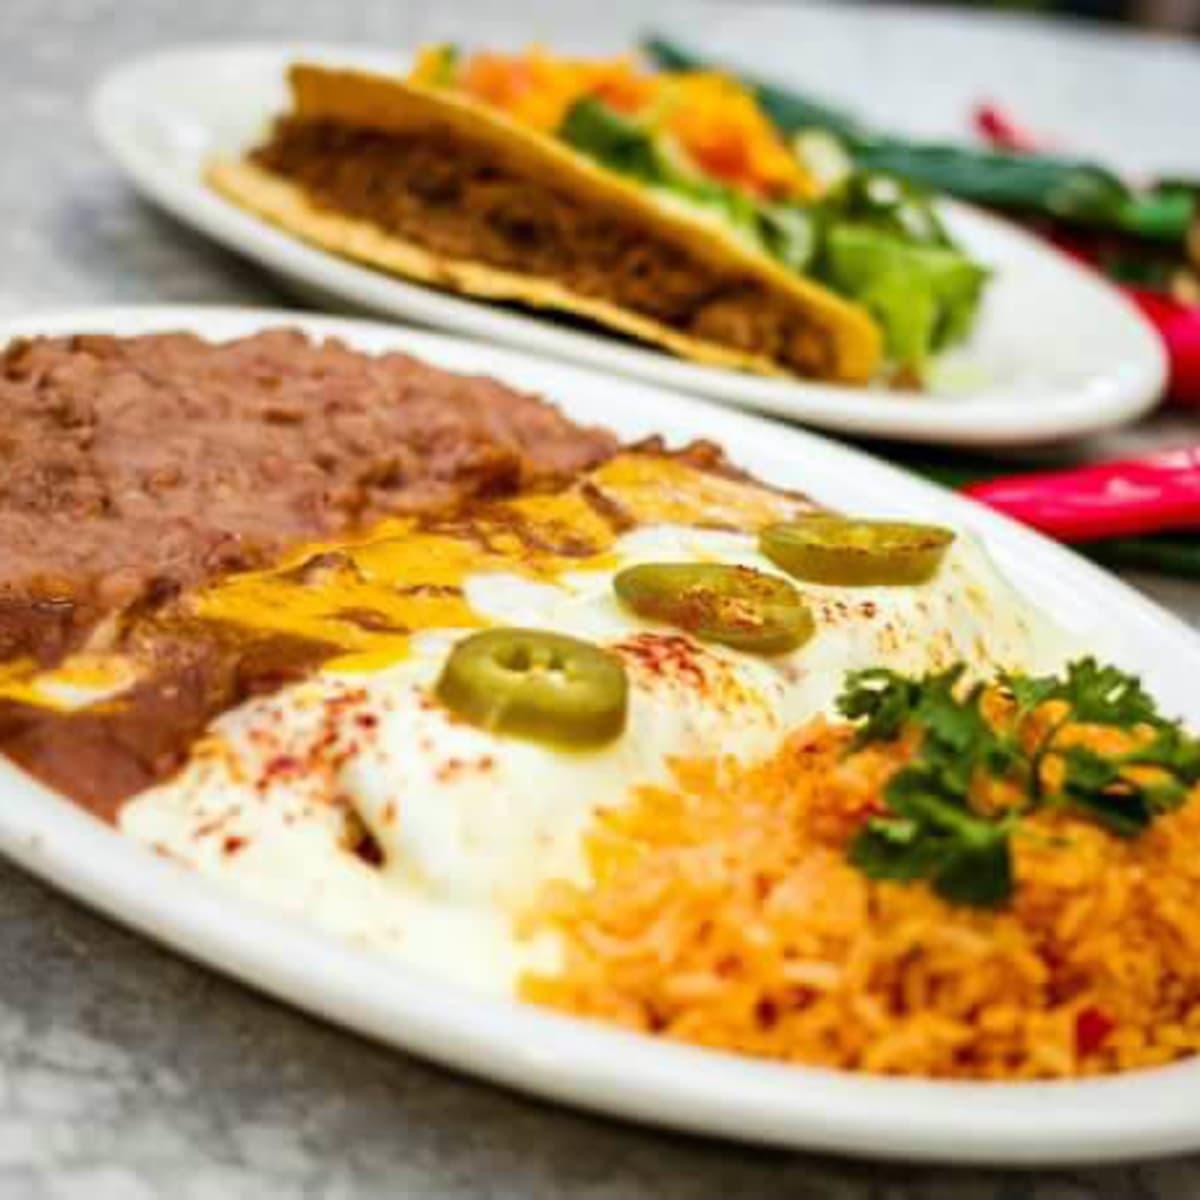 Enchiladas from Manny's